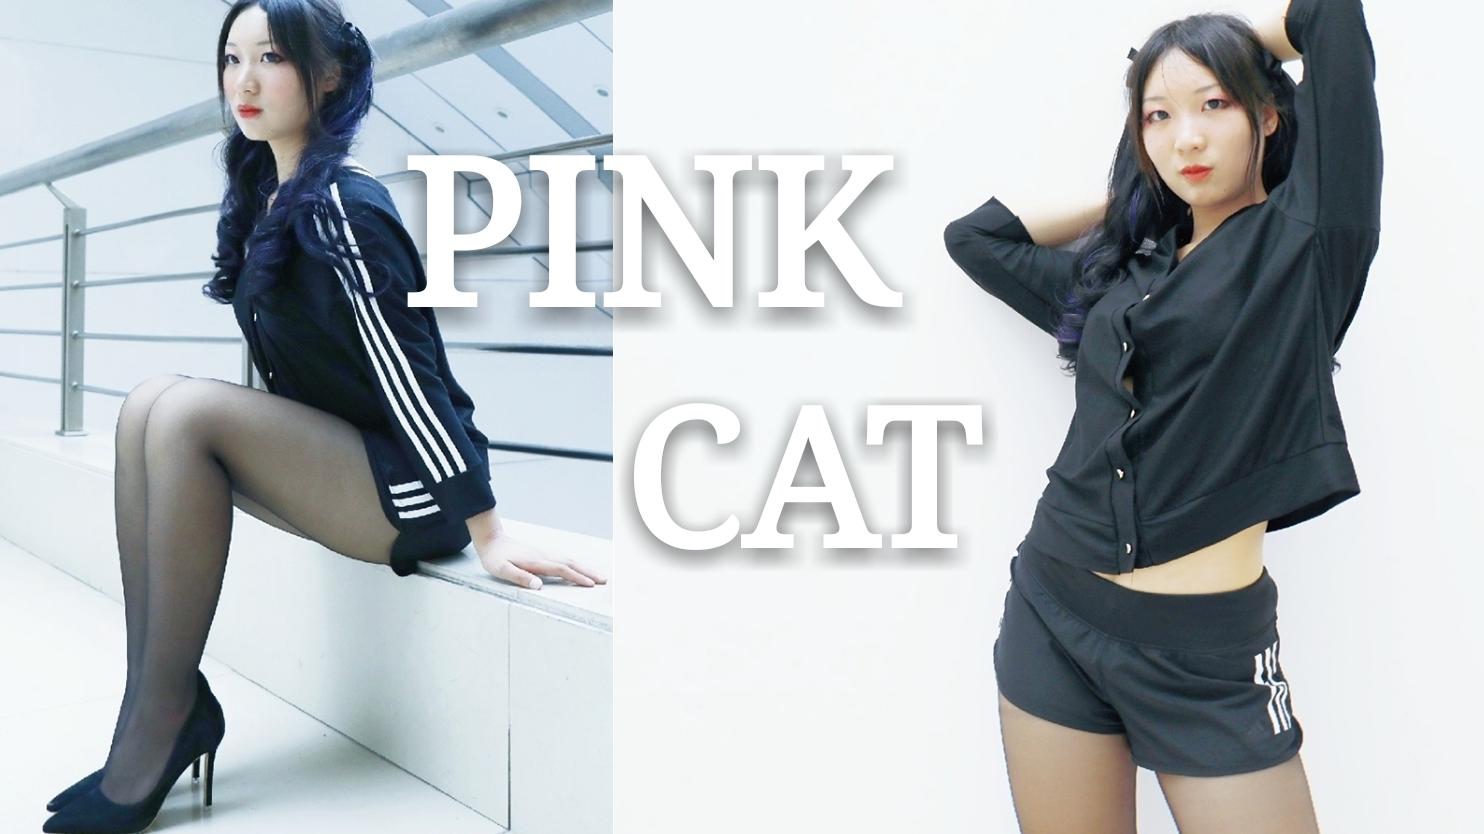 【安逸】PINK CAT【挠挠头】